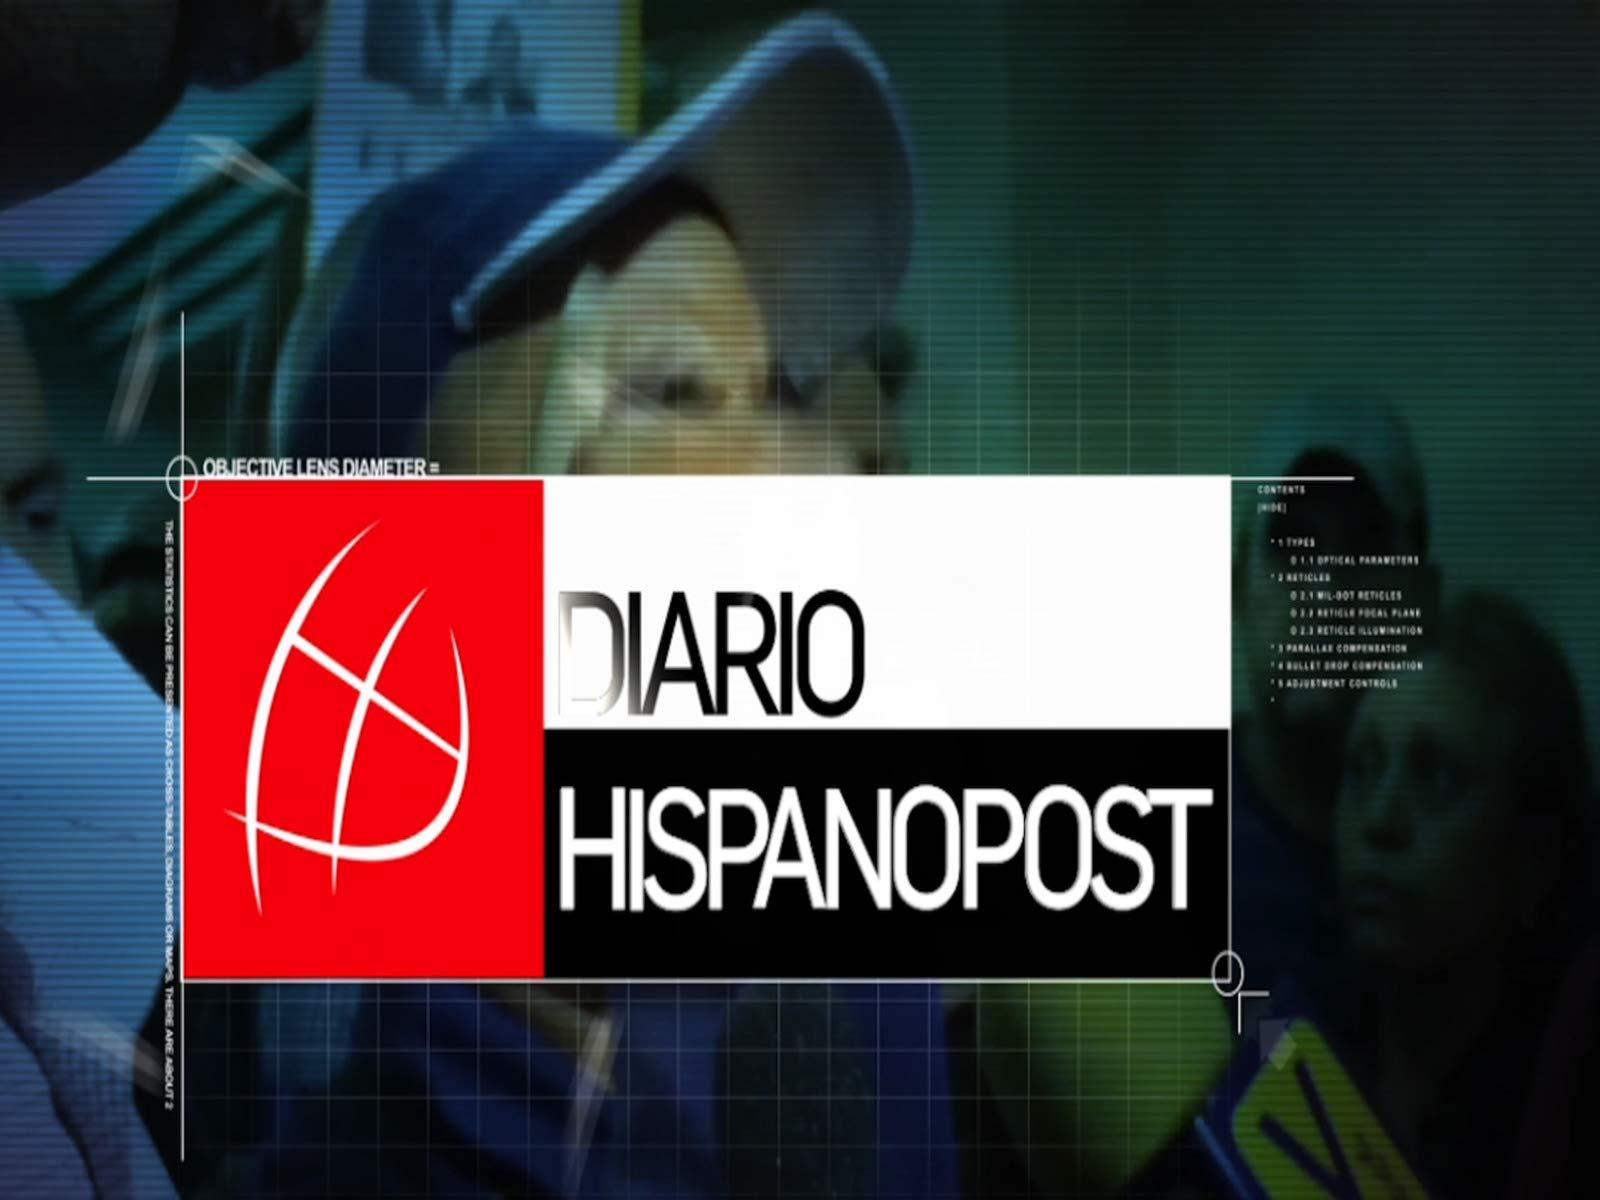 Amazon.com: Watch Diario HispanoPost | Prime Video